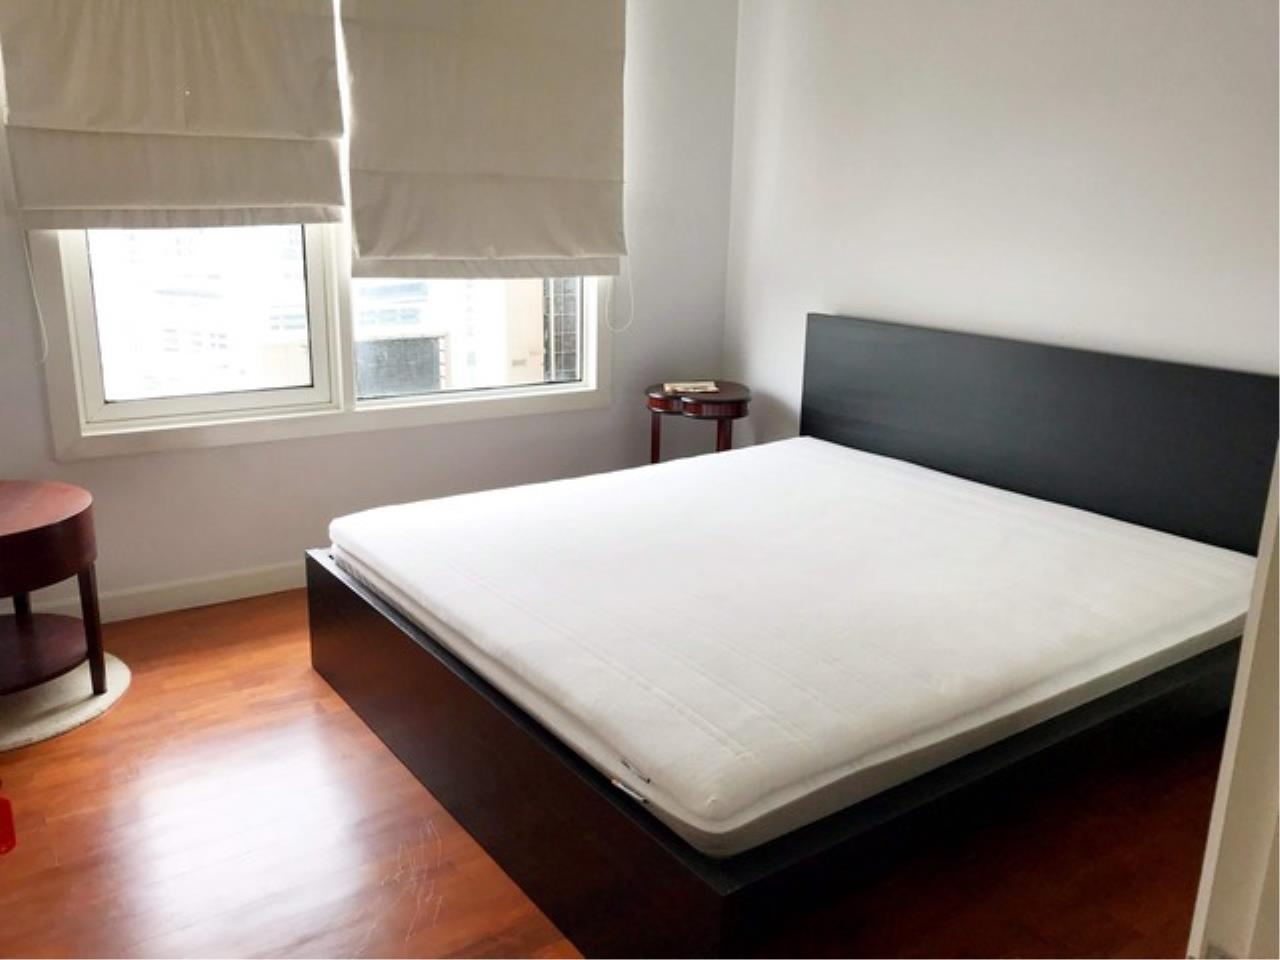 Ta (+66 9 5935 1592) Agency's SALE Condo Siri Residence by Sansiri 2 Bed near BTS Prompong Thonglor Emporium Best Price (163,000B/sqm) 6